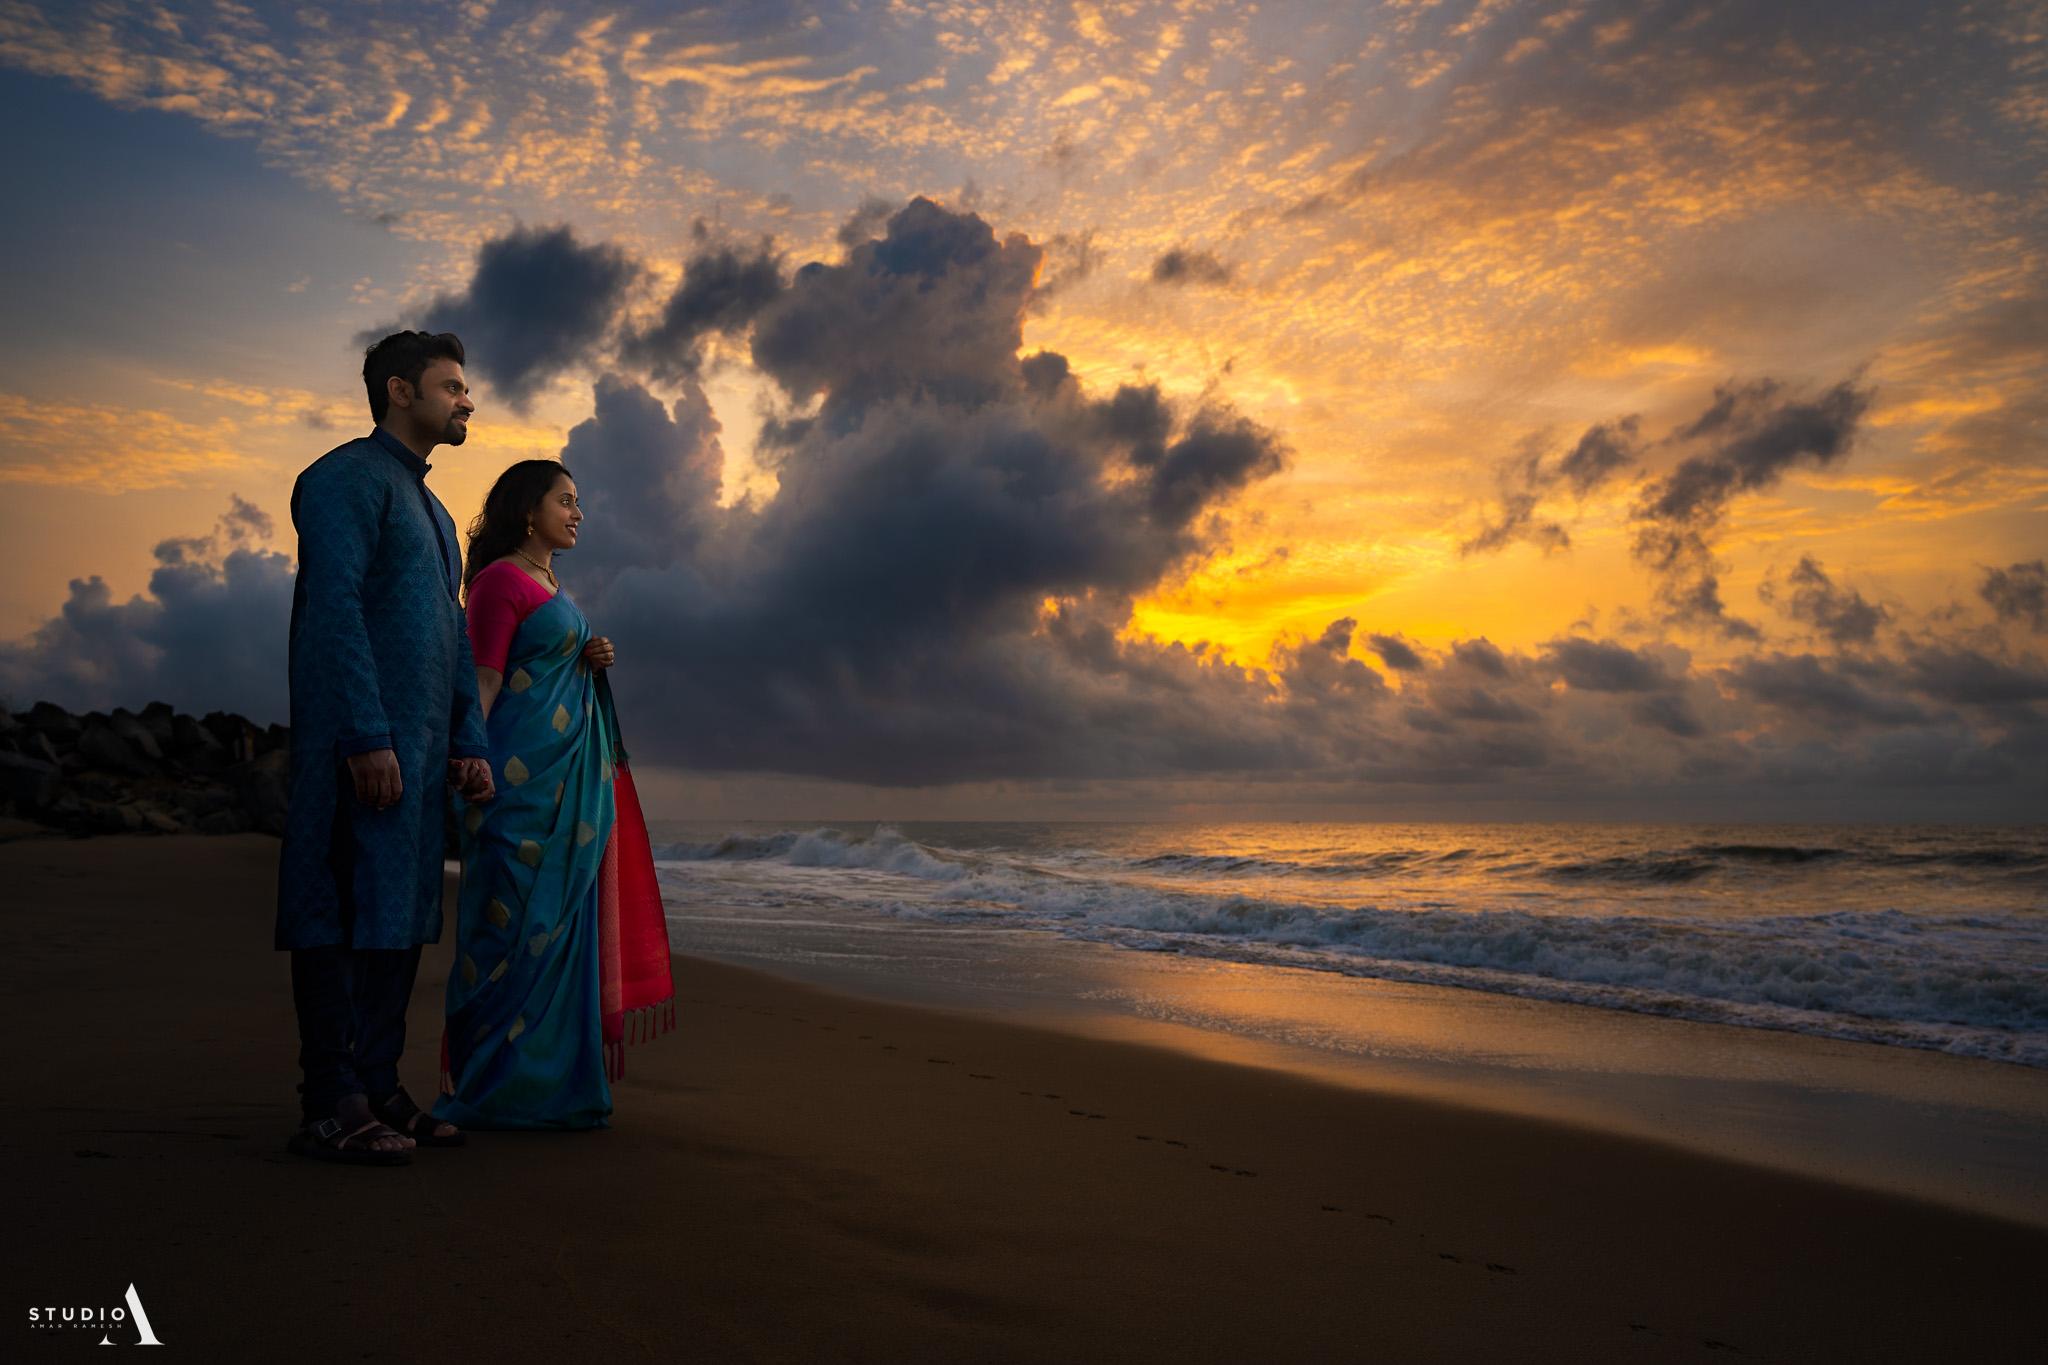 Studio-a-wedding-photographer-lakshman-1